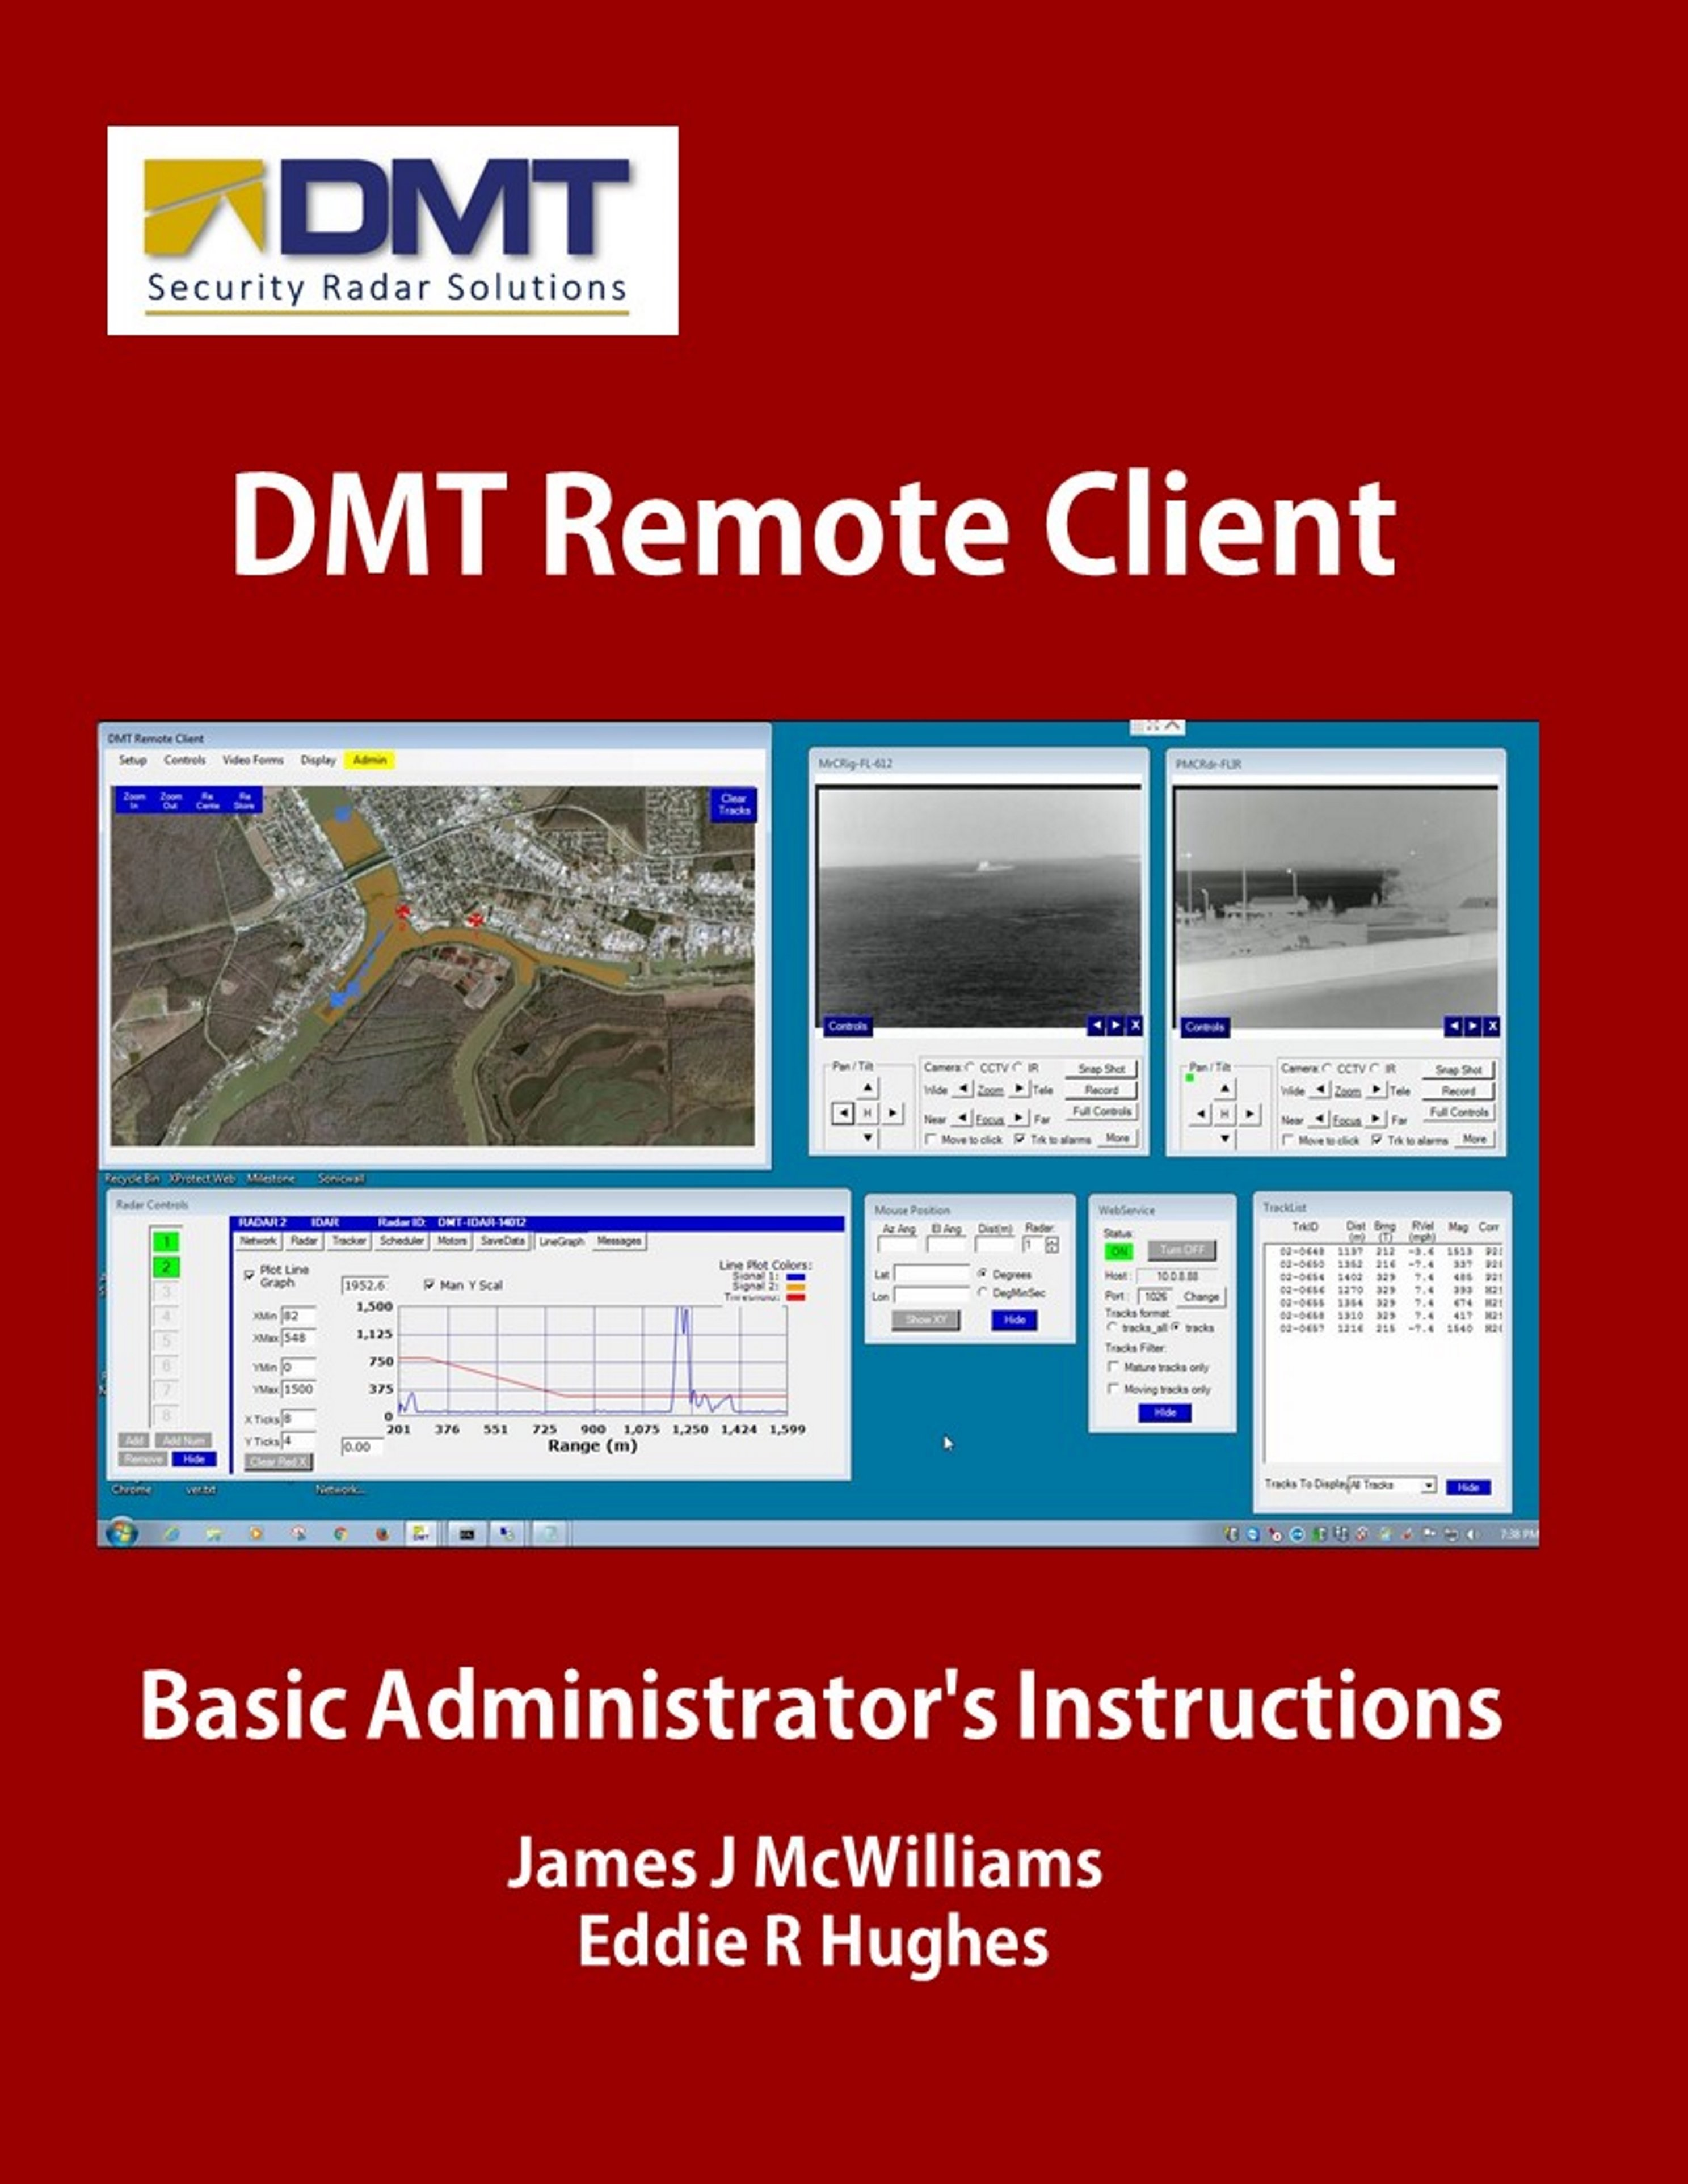 DMT Remote Client Manual for Adminstrators 00000